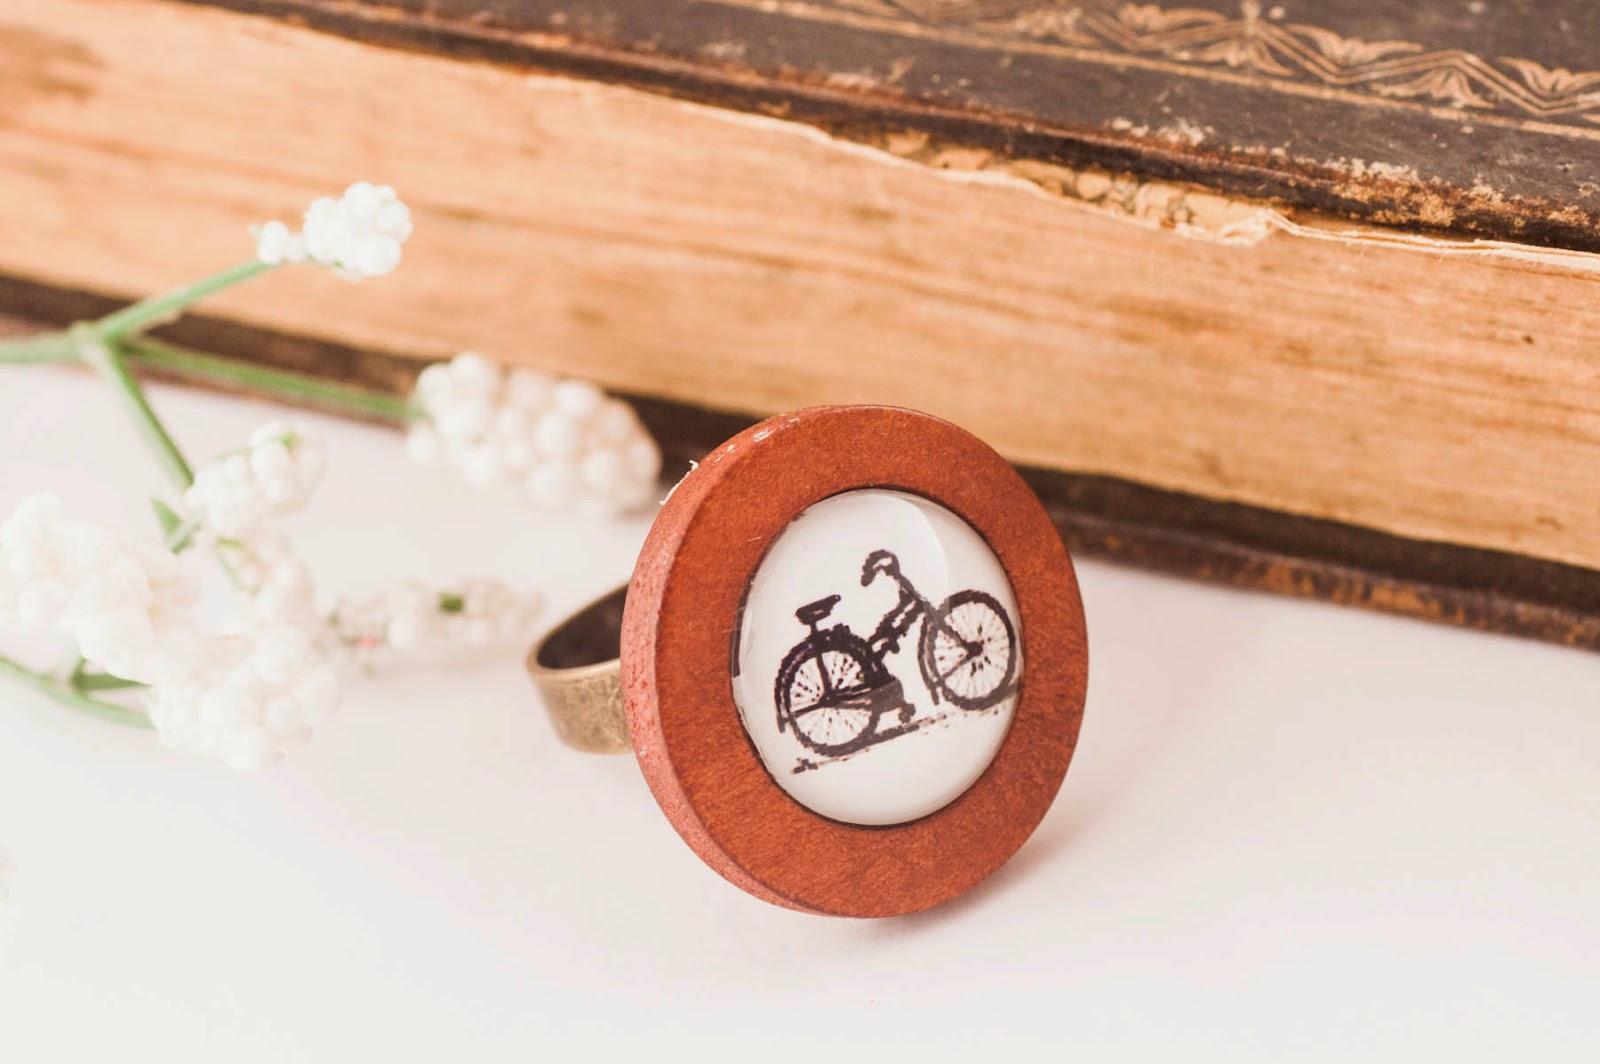 http://www.pinkbijou.com/index.php/anillo-bicicleta-madera/